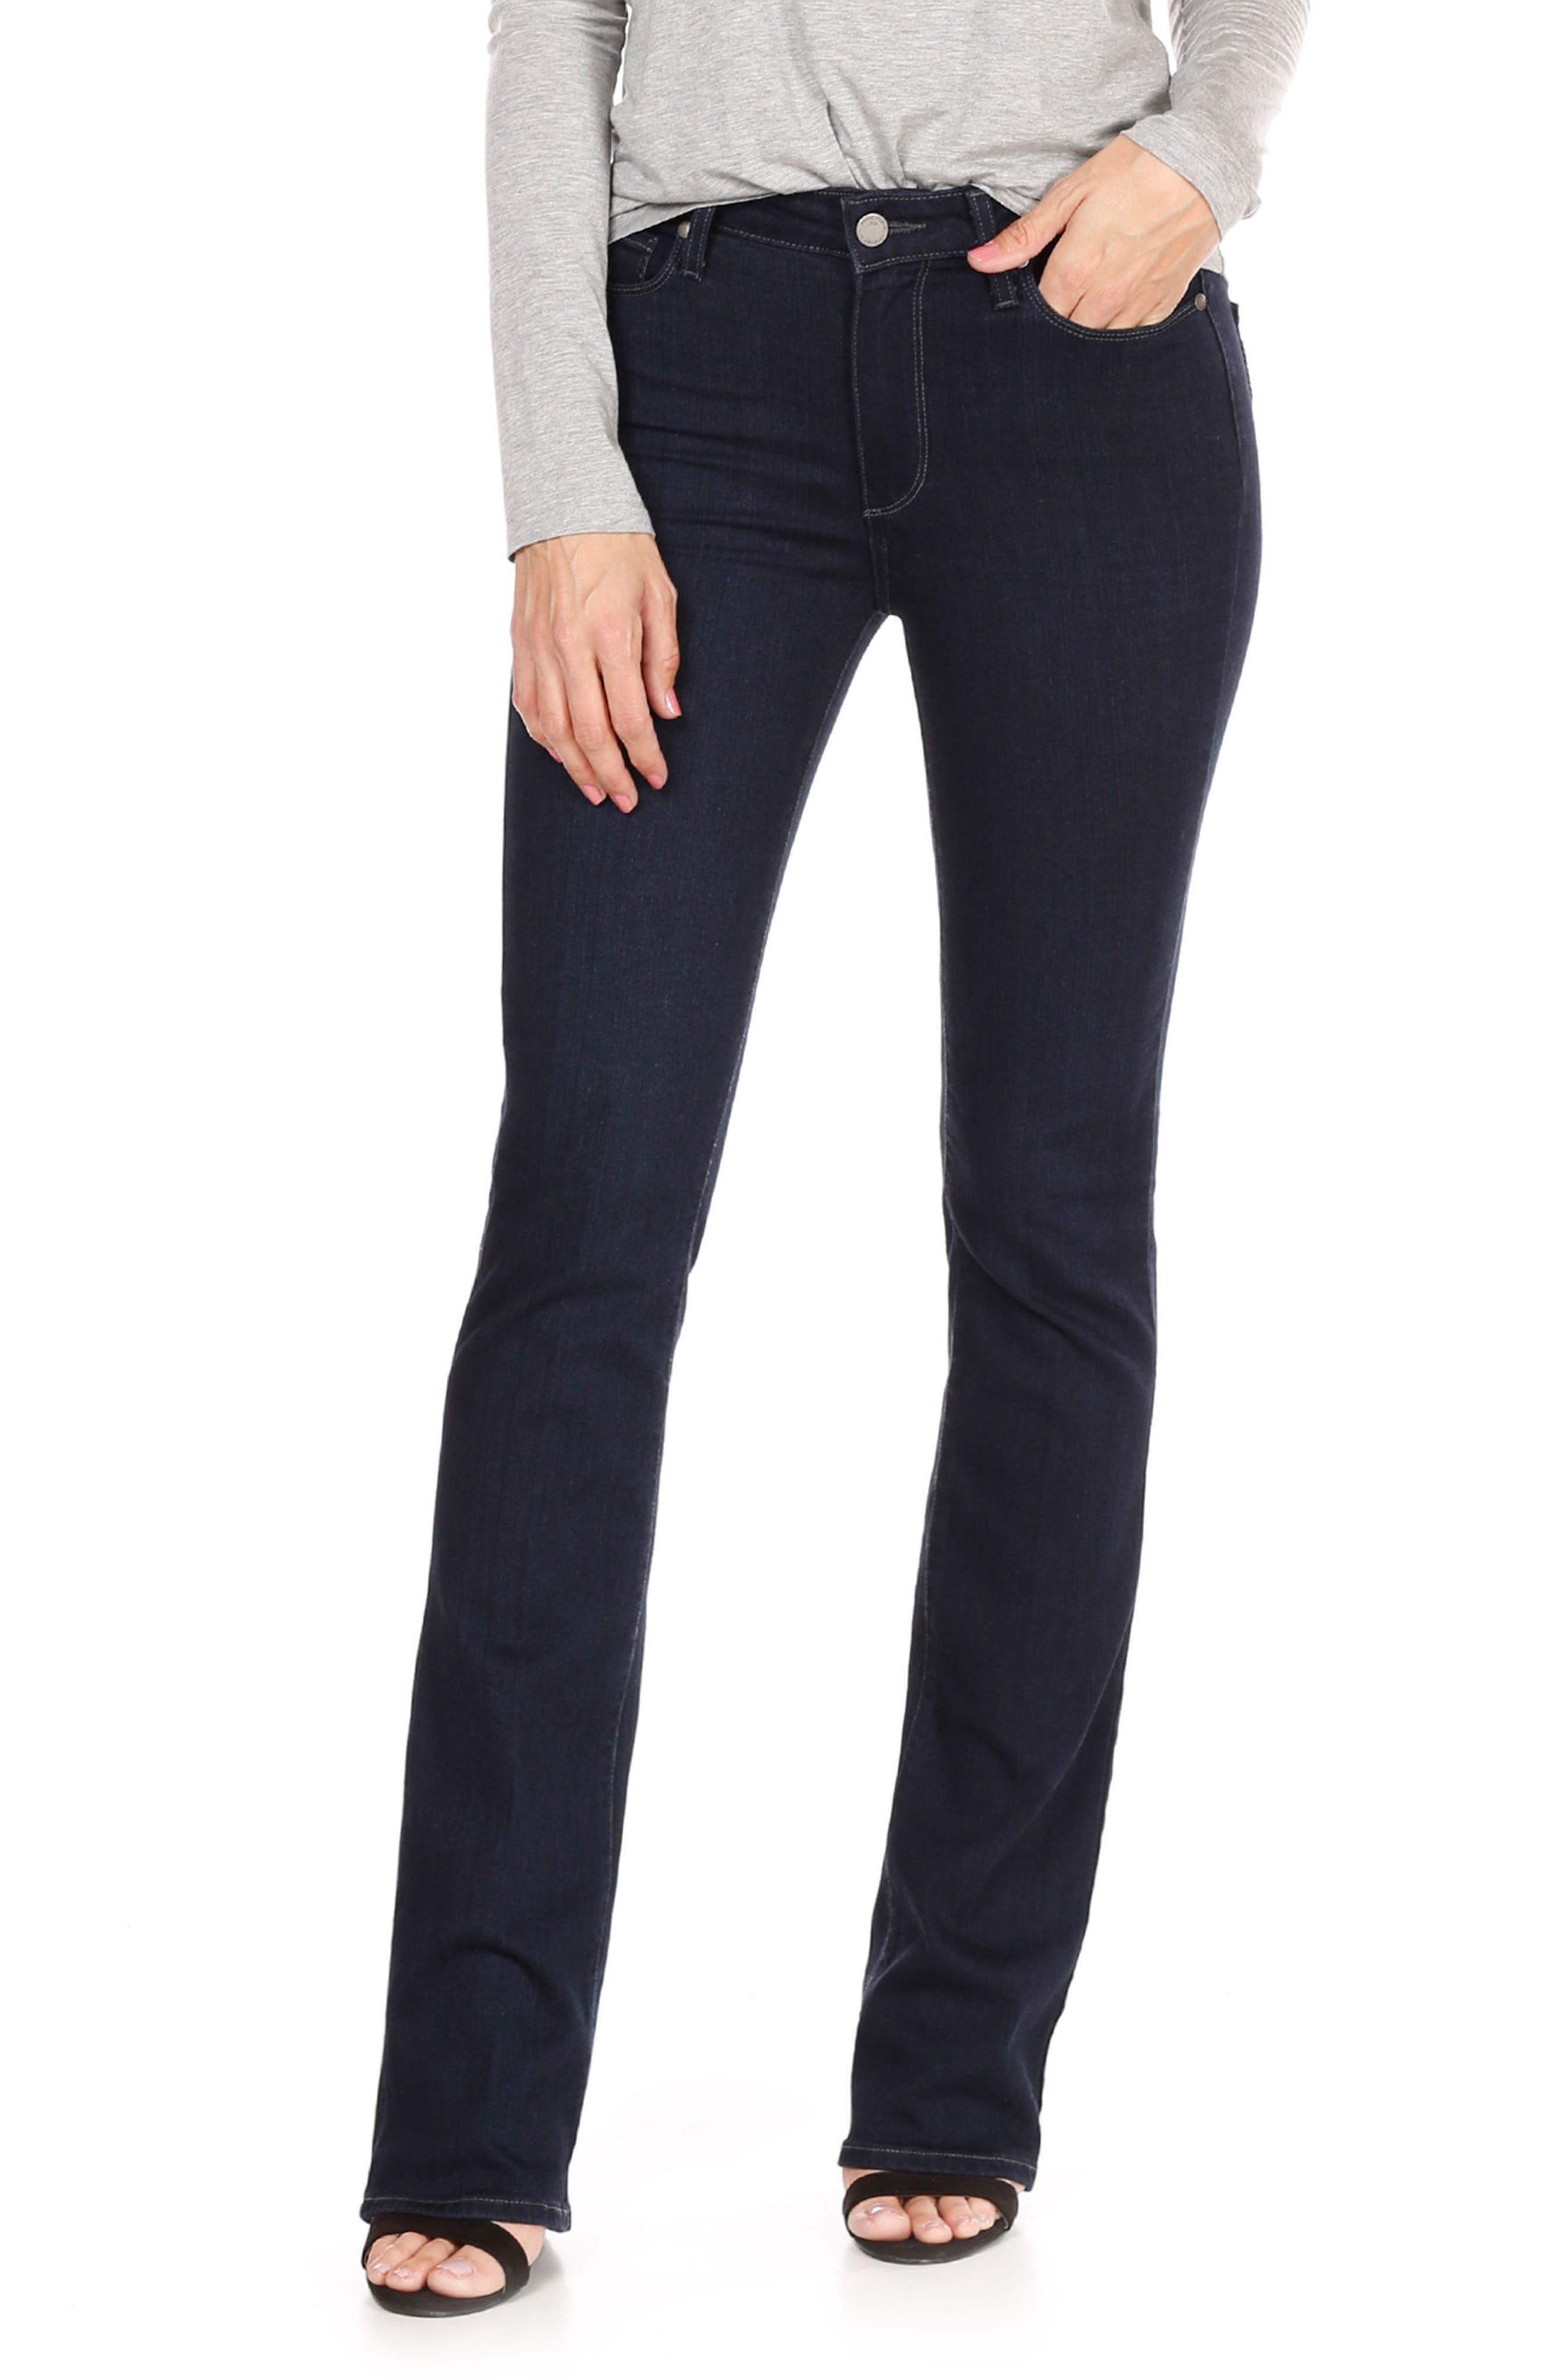 PAIGE Transcend - Manhattan High Waist Bootcut Jeans (Dalton) (Petite)